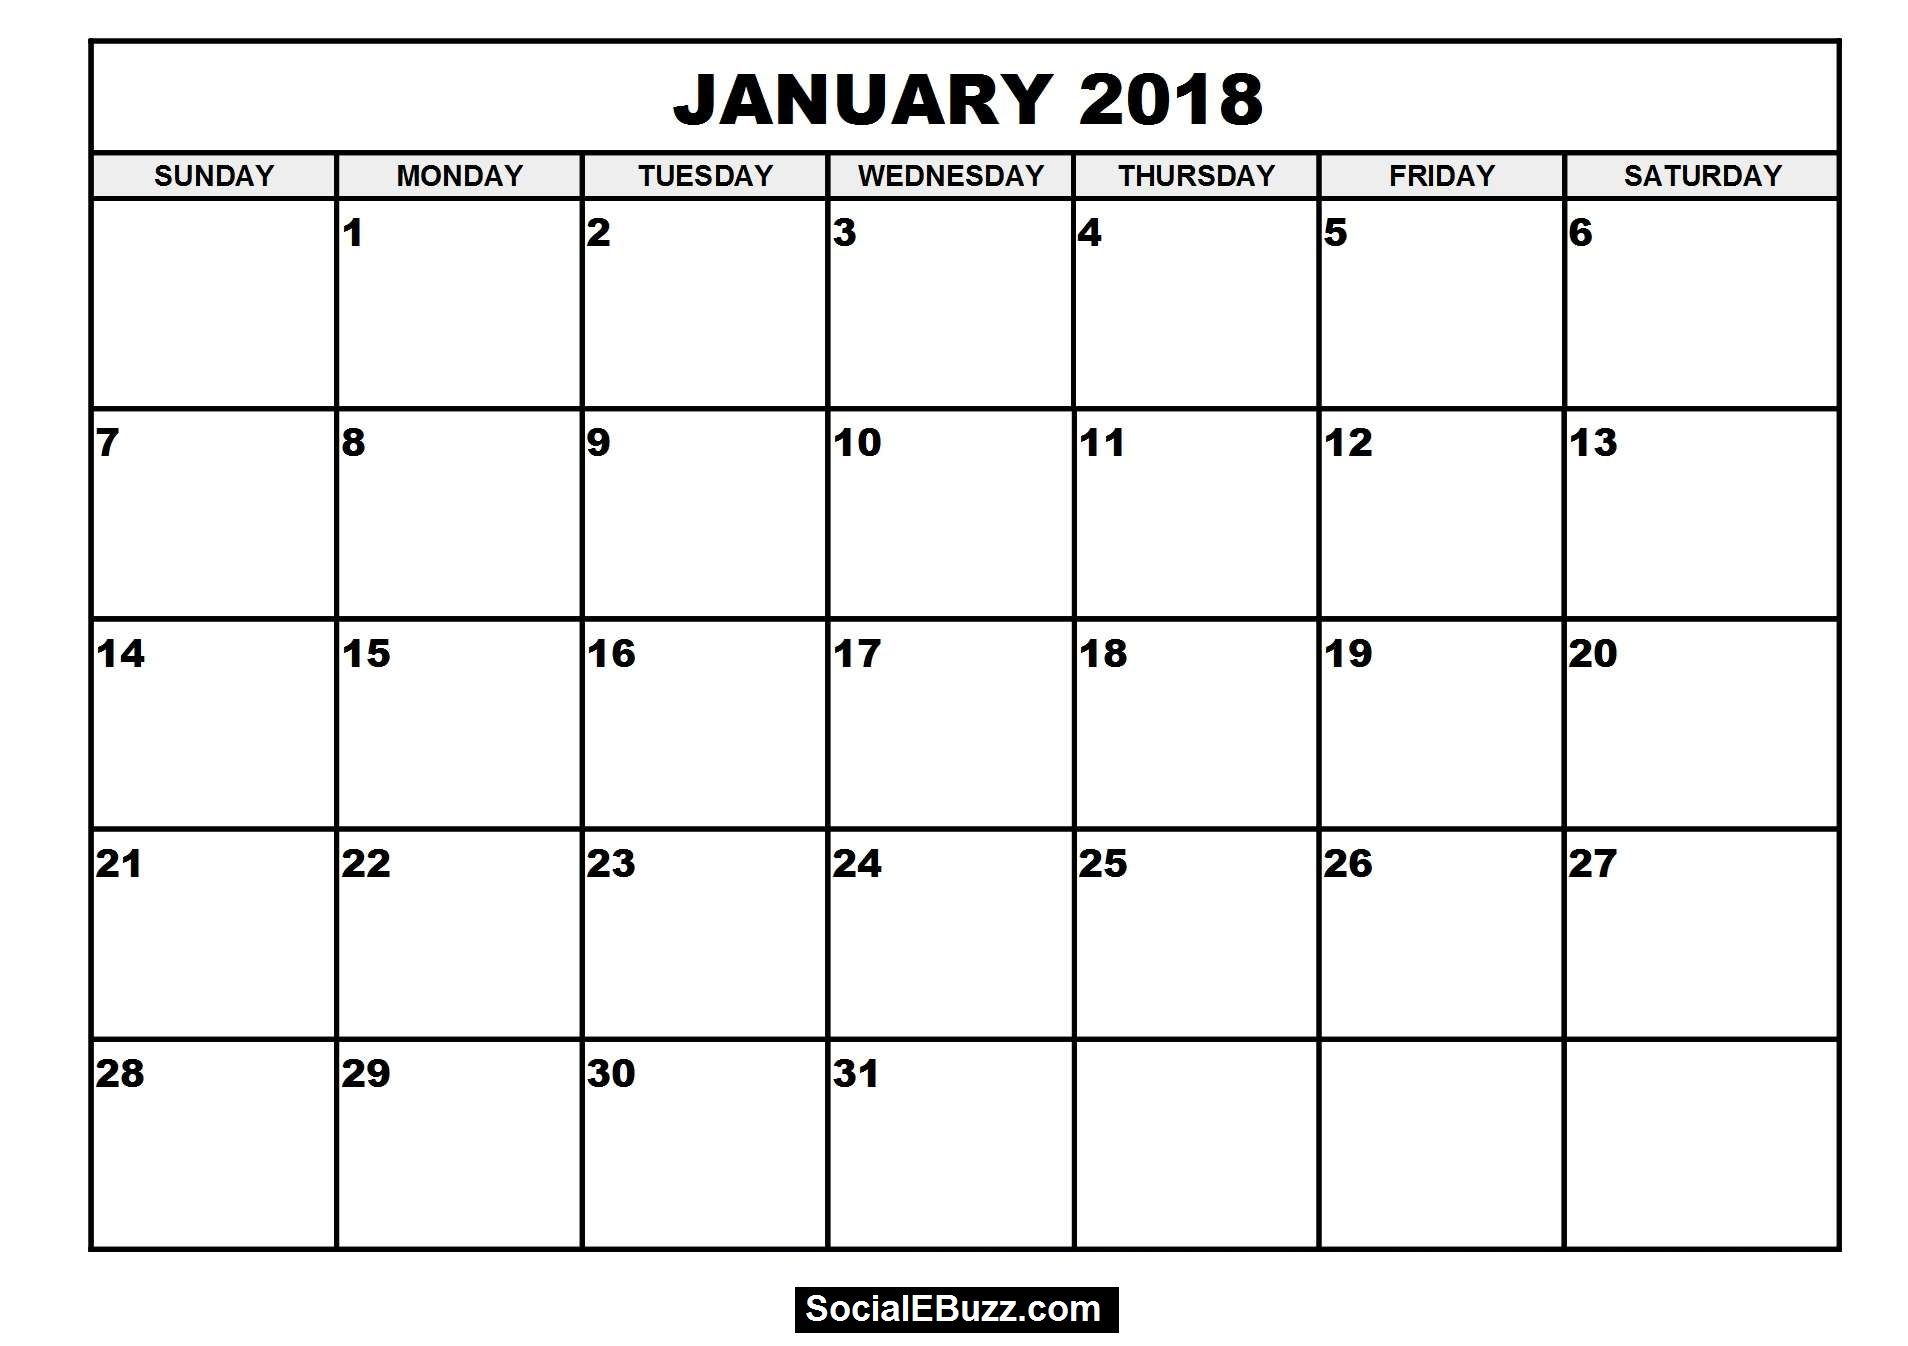 January 2018 Calendar Printable Template With Holidays Pdf Usa Uk